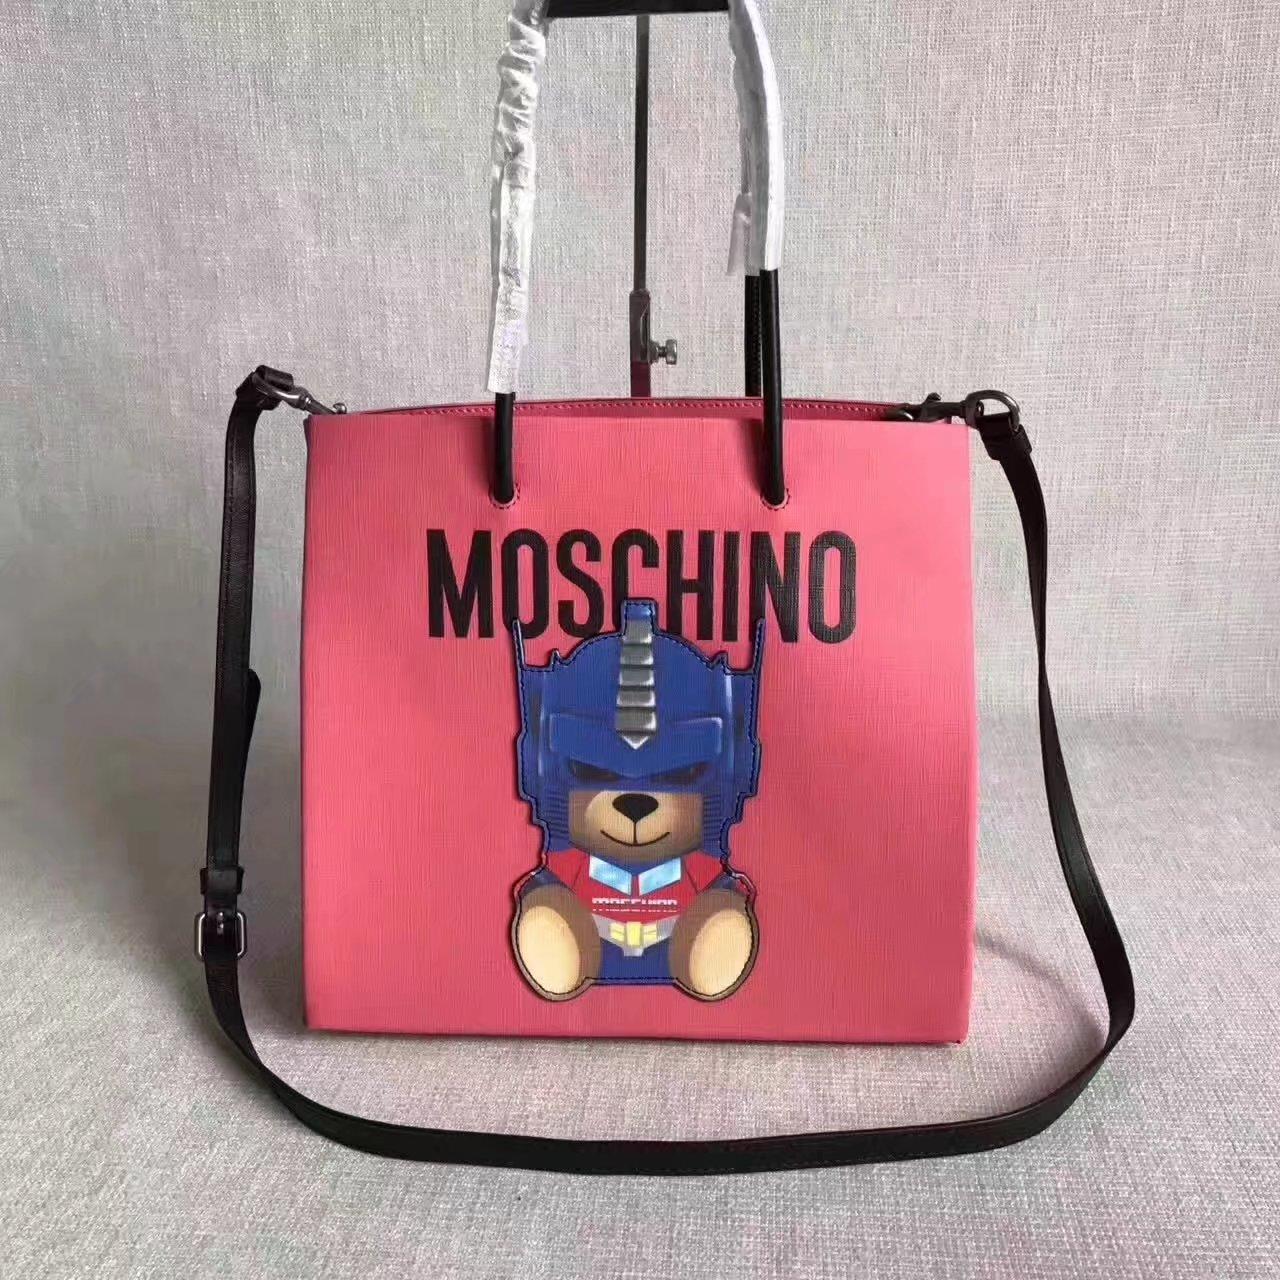 Moschino TRANSFORMERS Women Tote Bag Pink